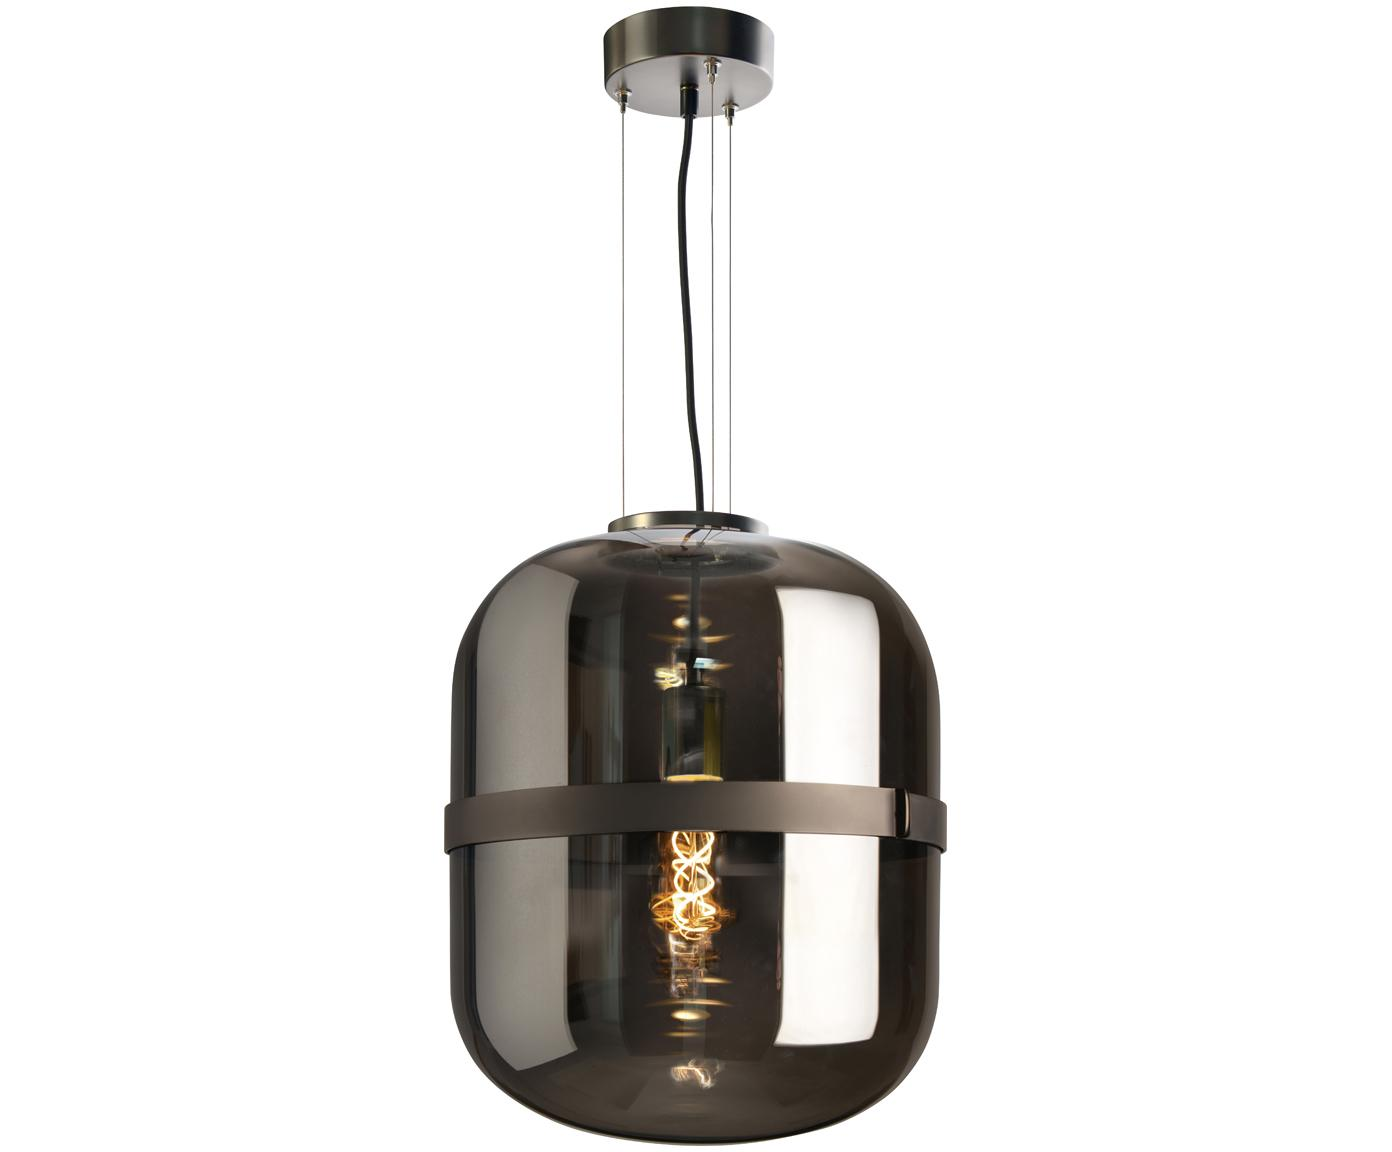 Pendelleuchte Baloni aus Rauchglas, Lampenschirm: Glas, Dunkelgrau, Ø 34 x H 45 cm